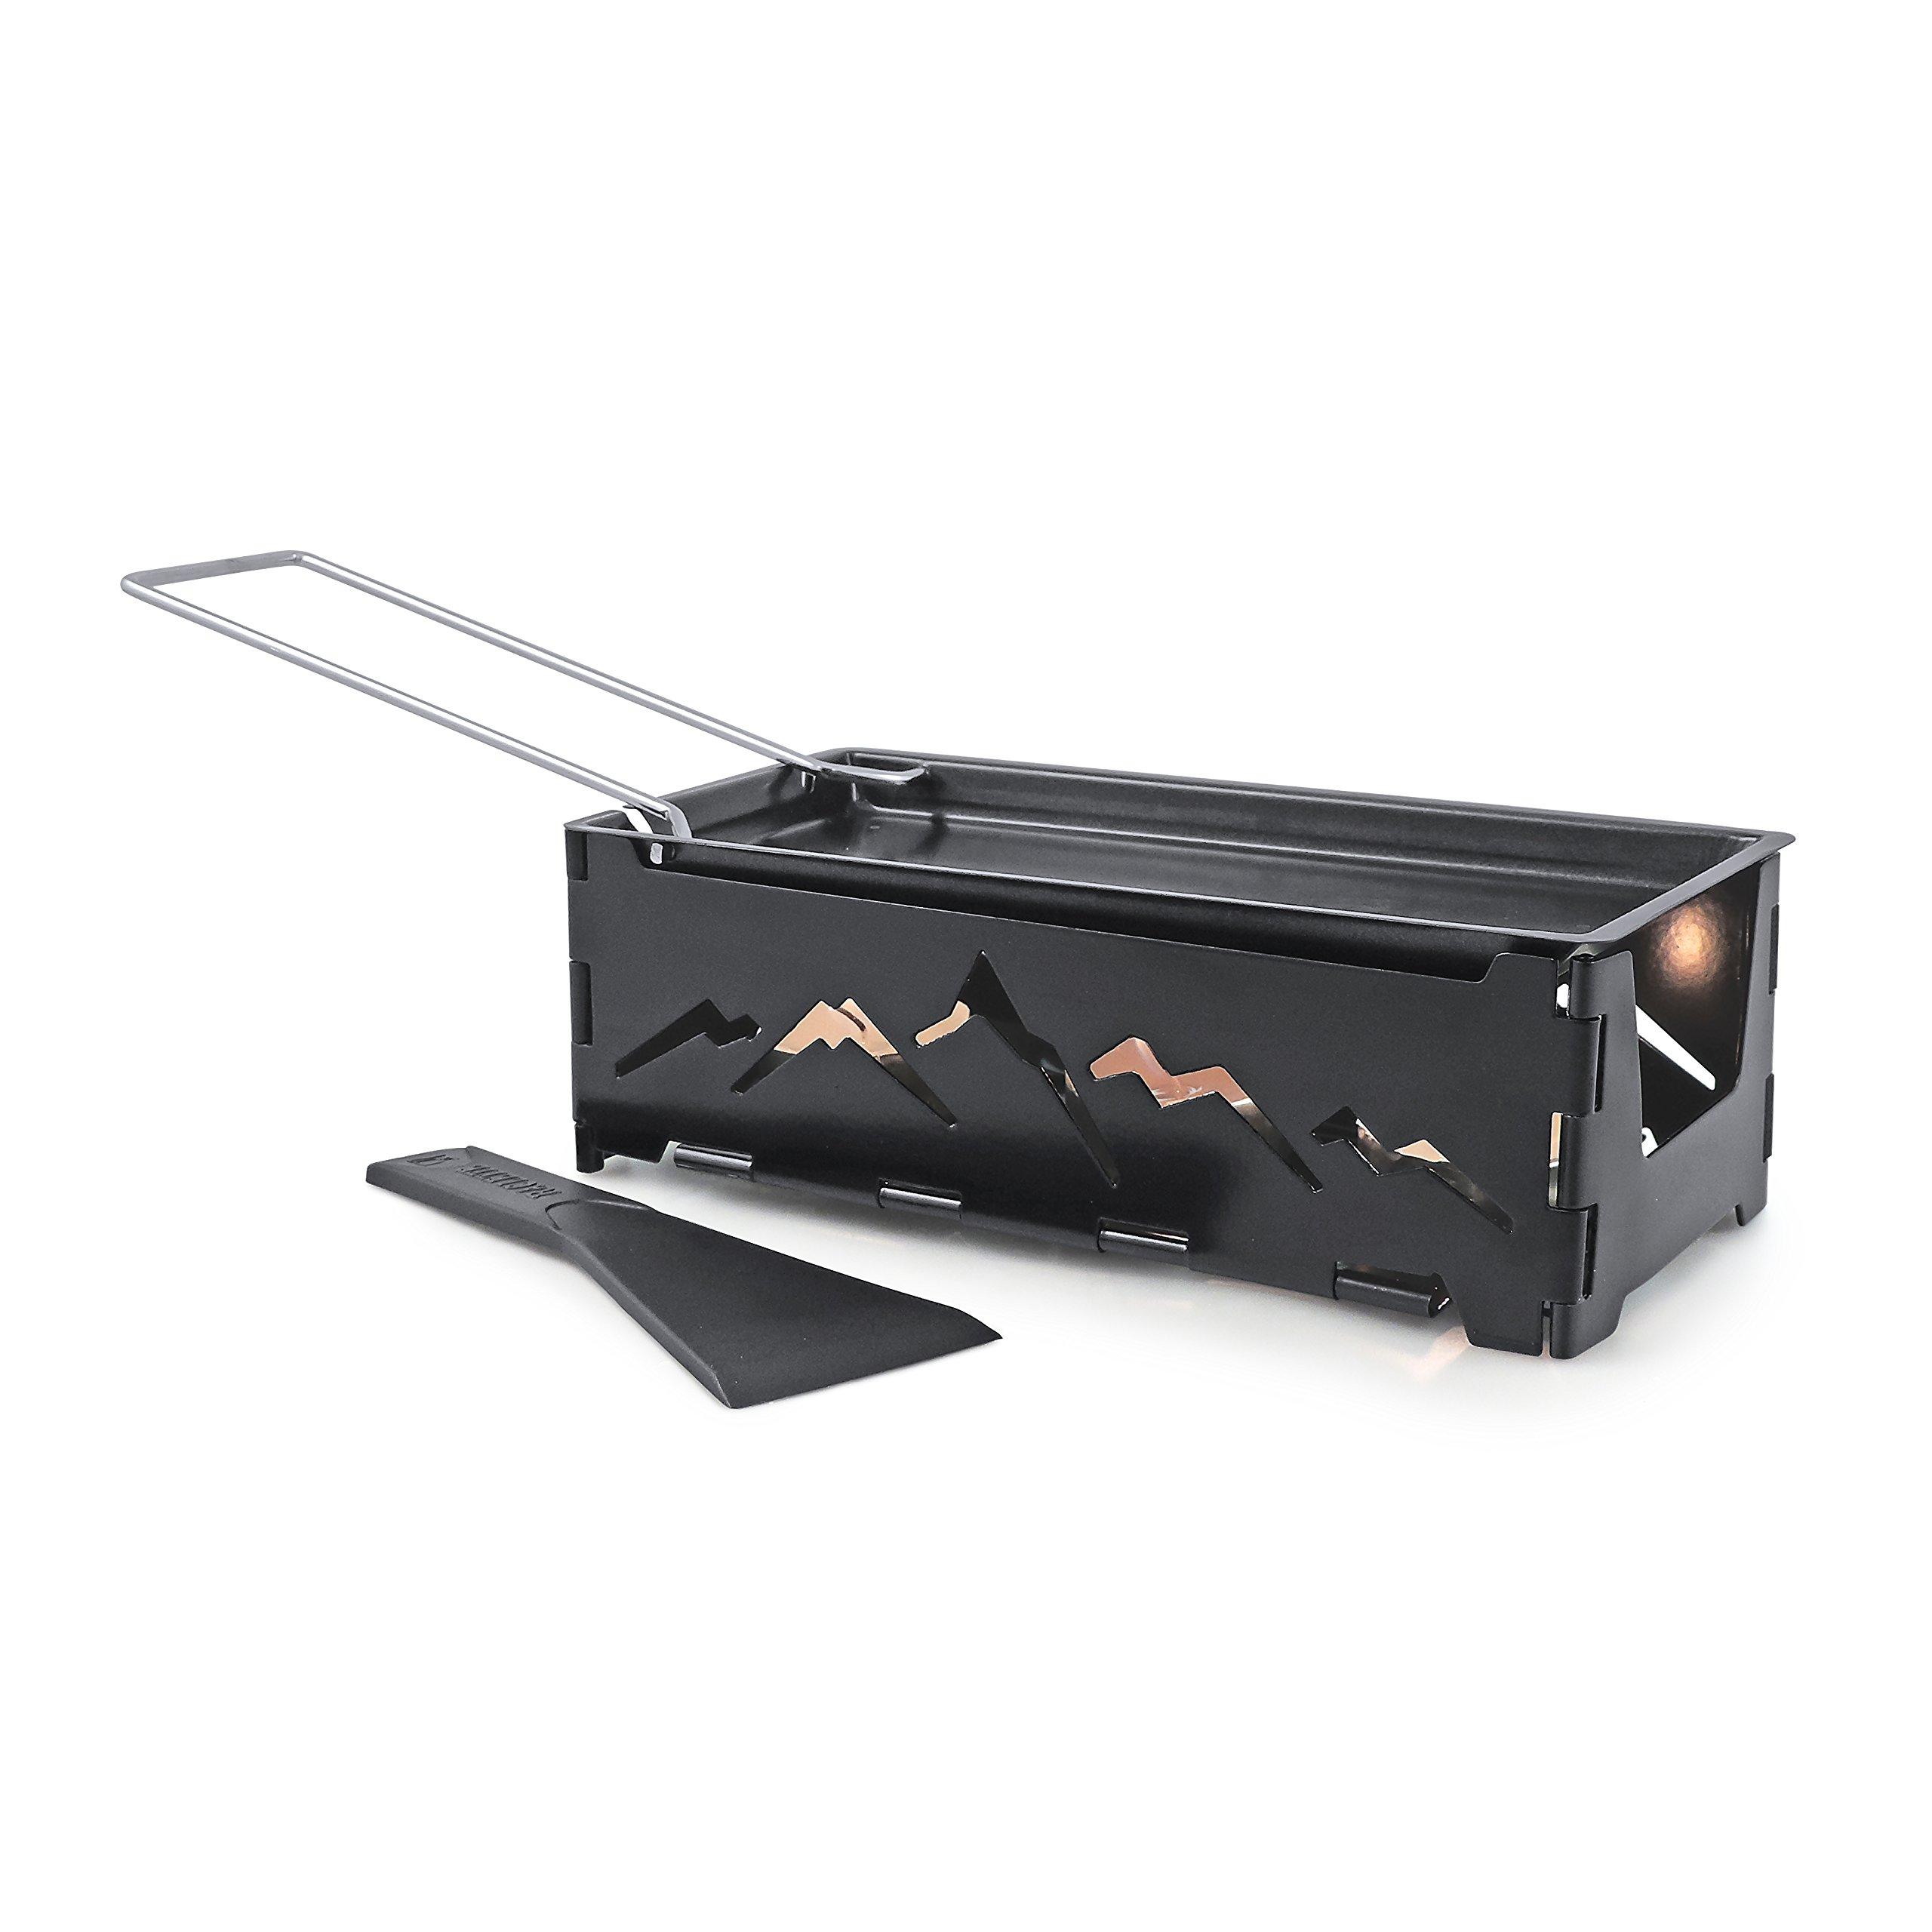 Swissmar Nordic Foldable Candlelight Raclette, Black